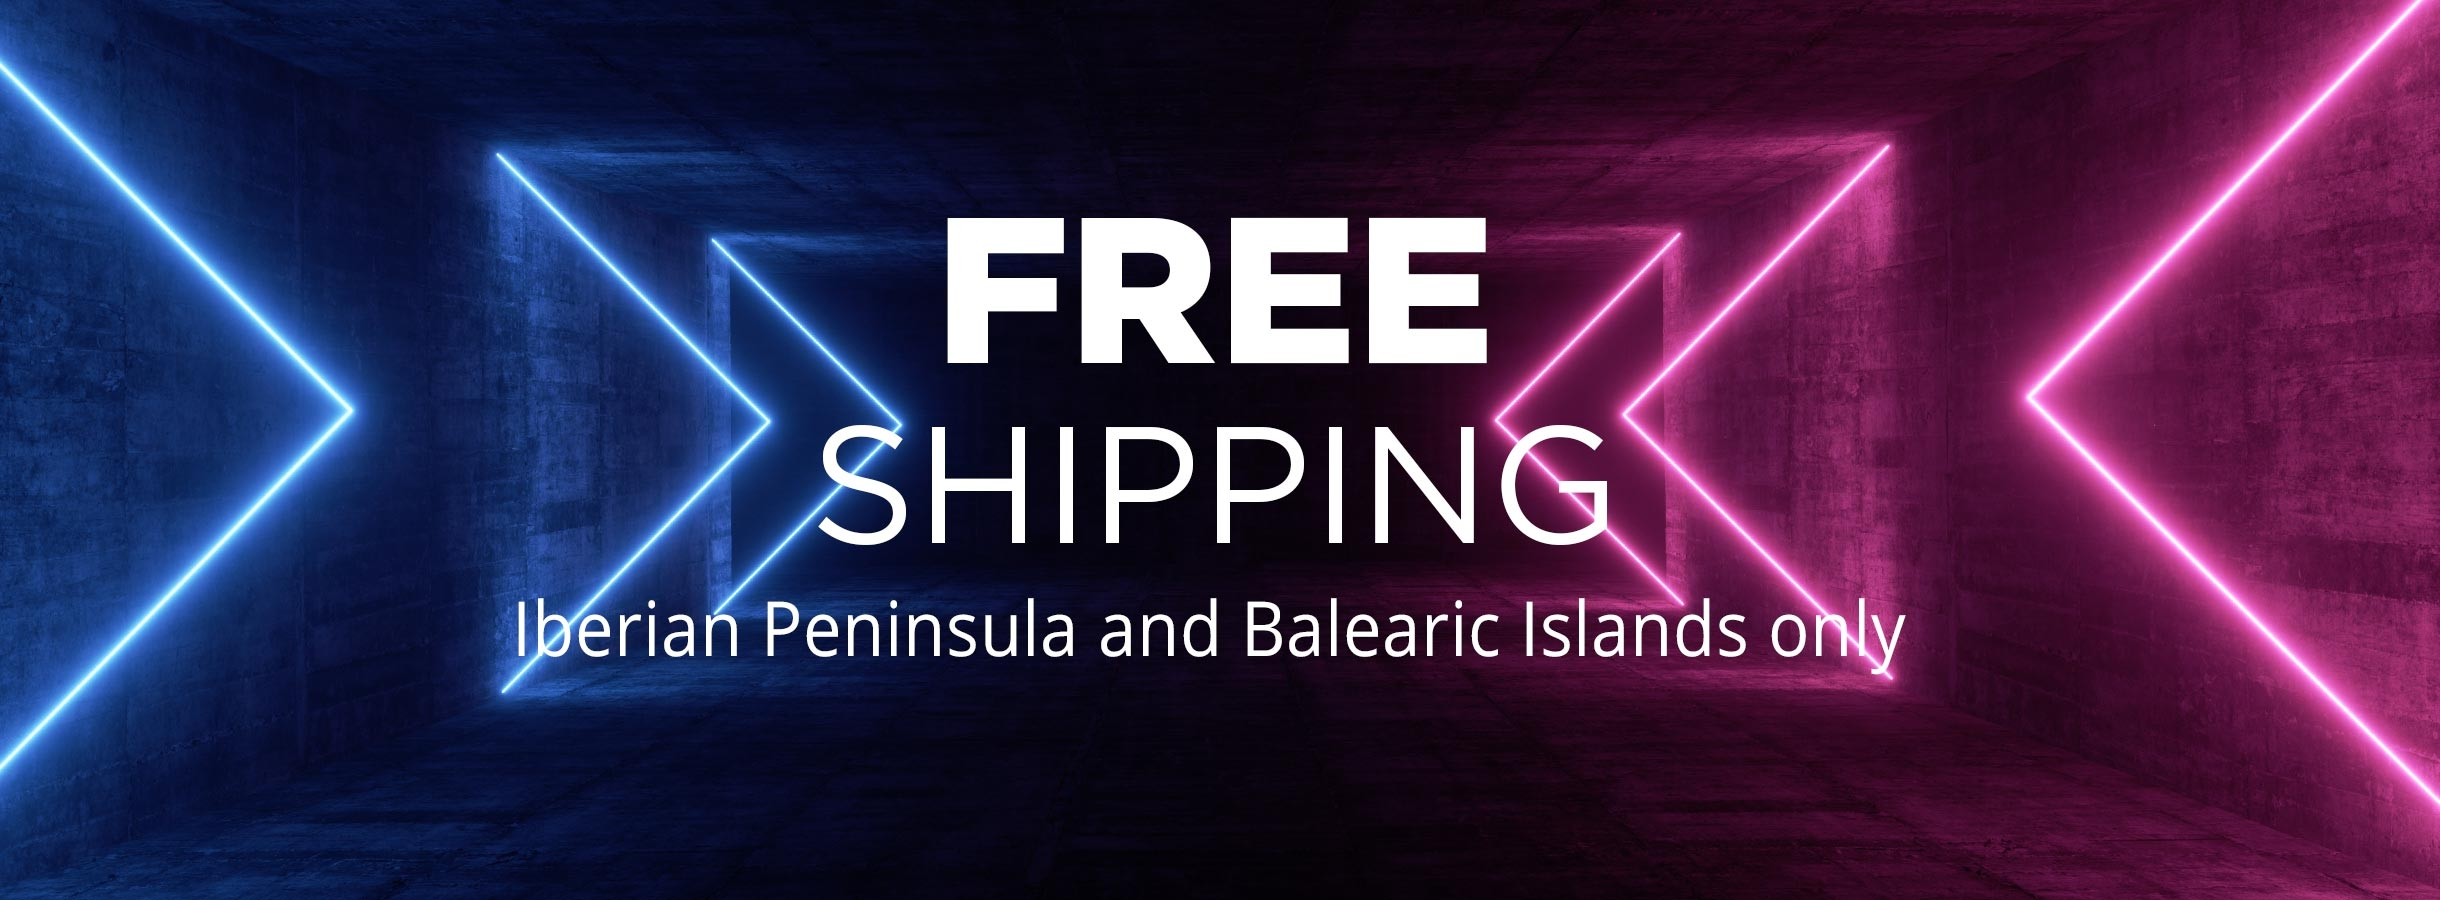 Free shippping